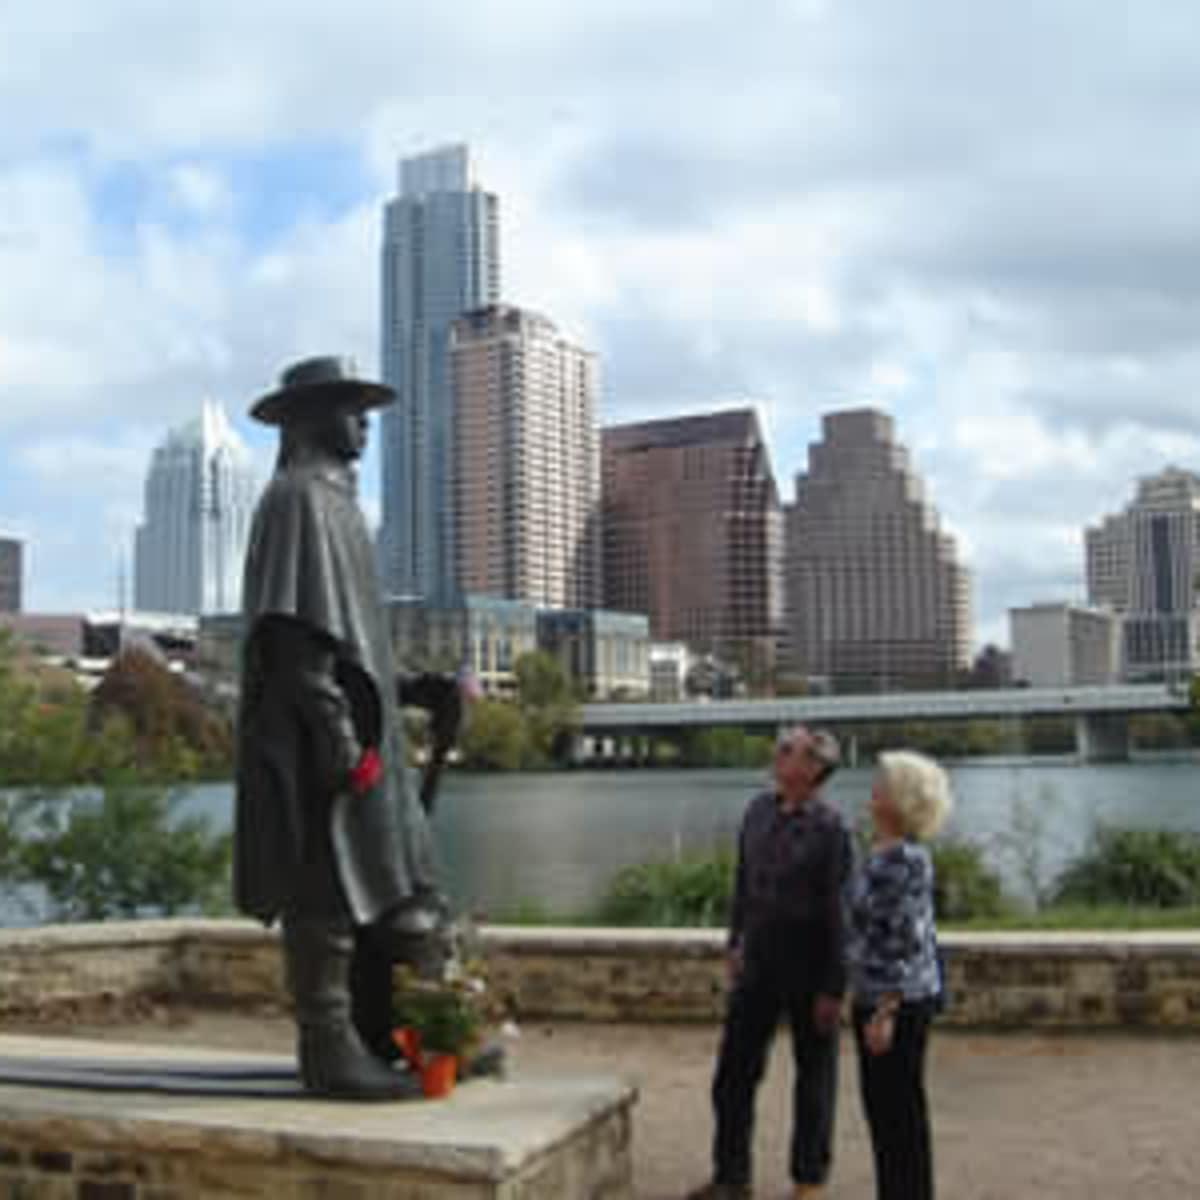 Austin_photo: places_outdoors_ladybird_statue